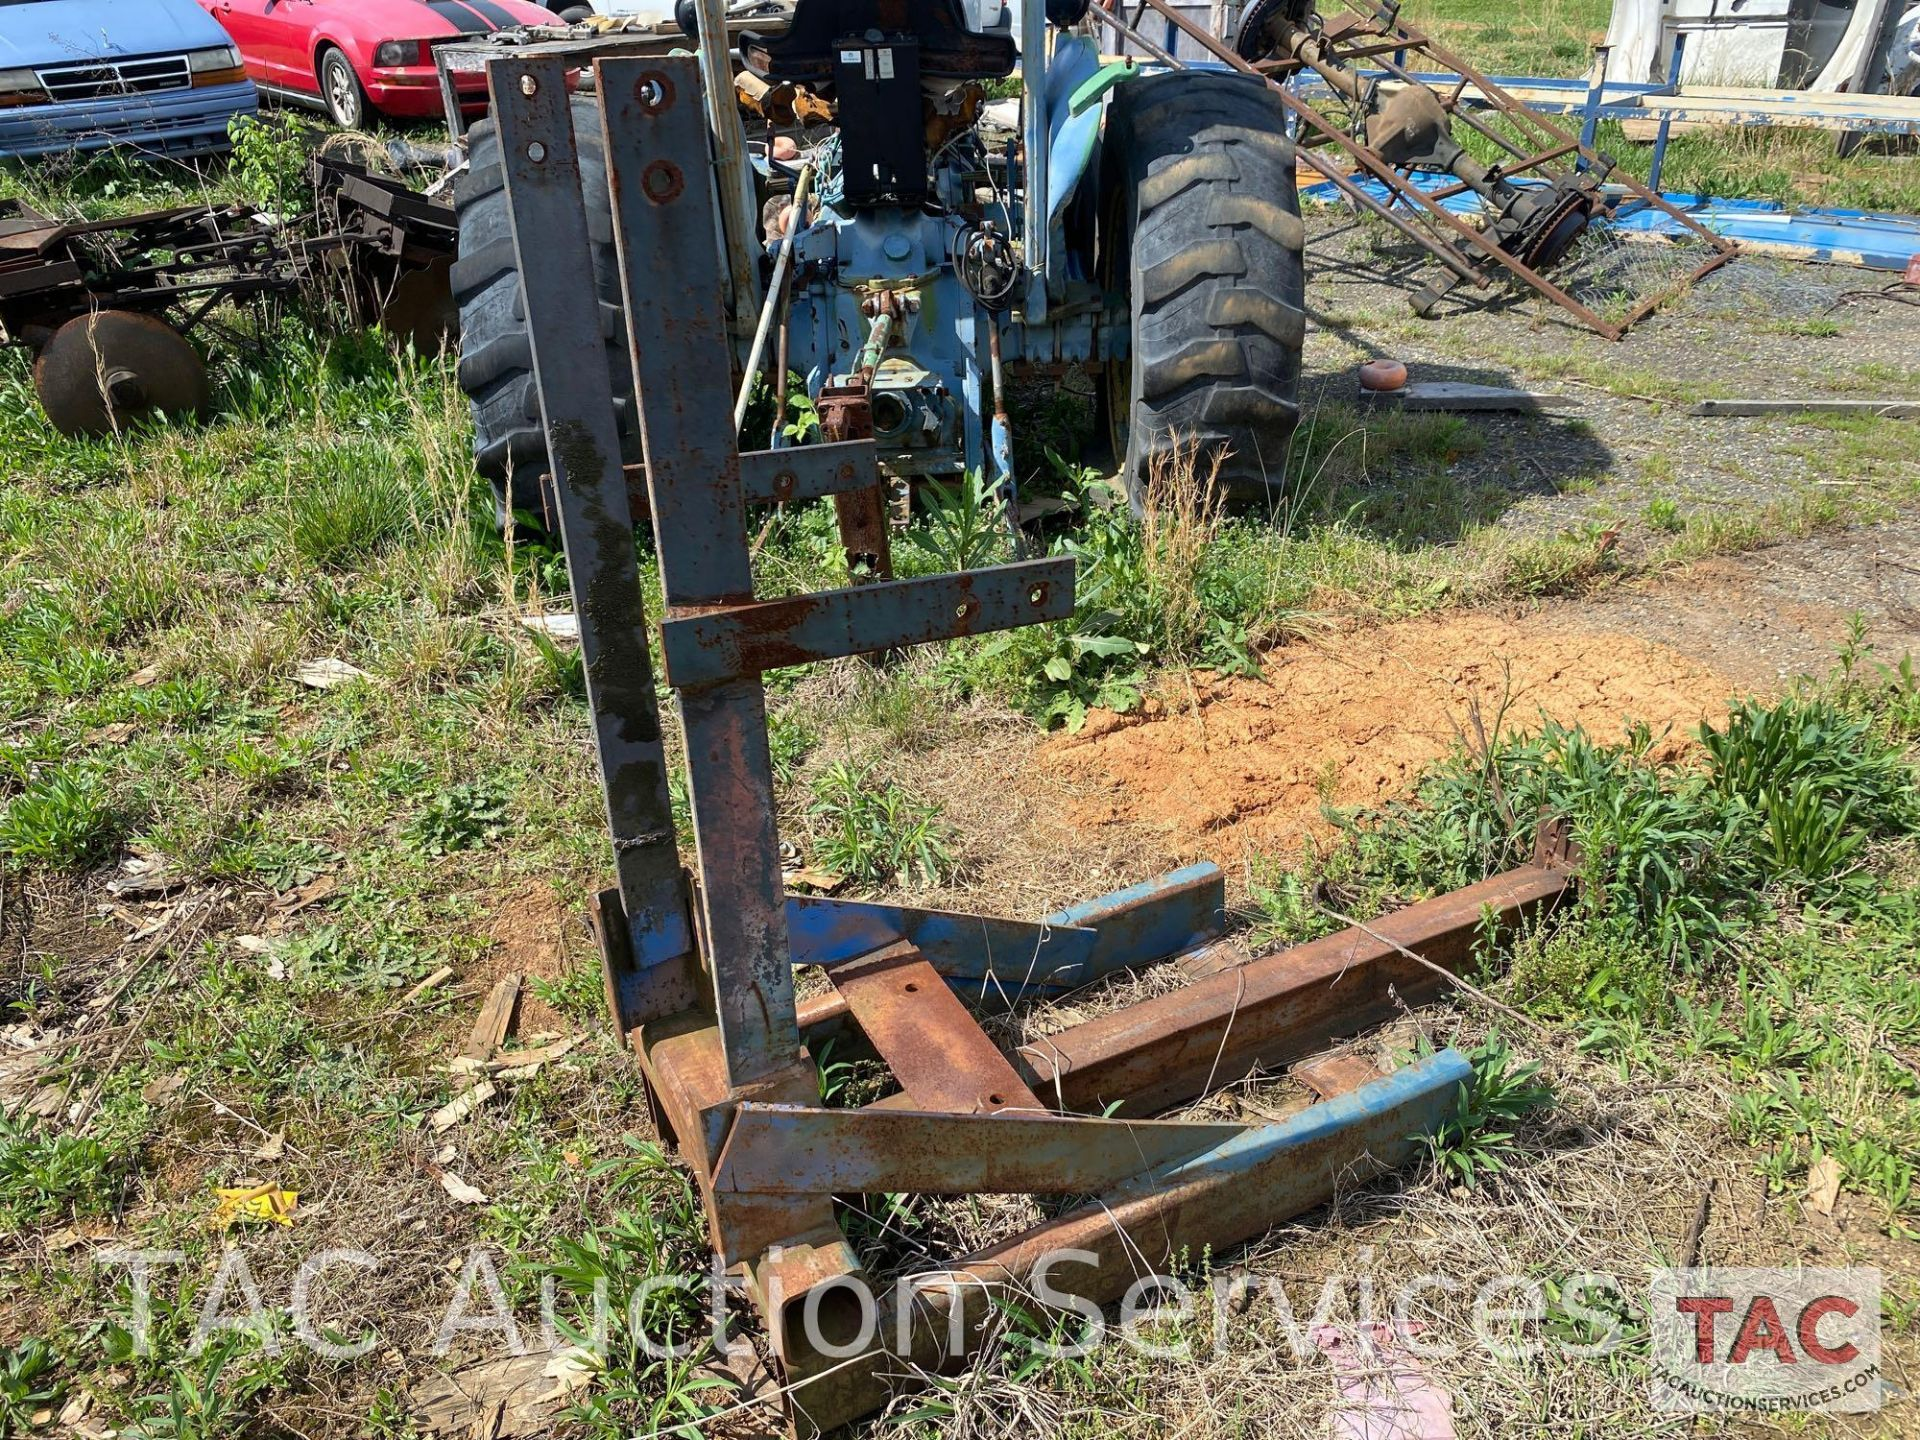 John Deere 2150 Farm Tractor - Image 25 of 34